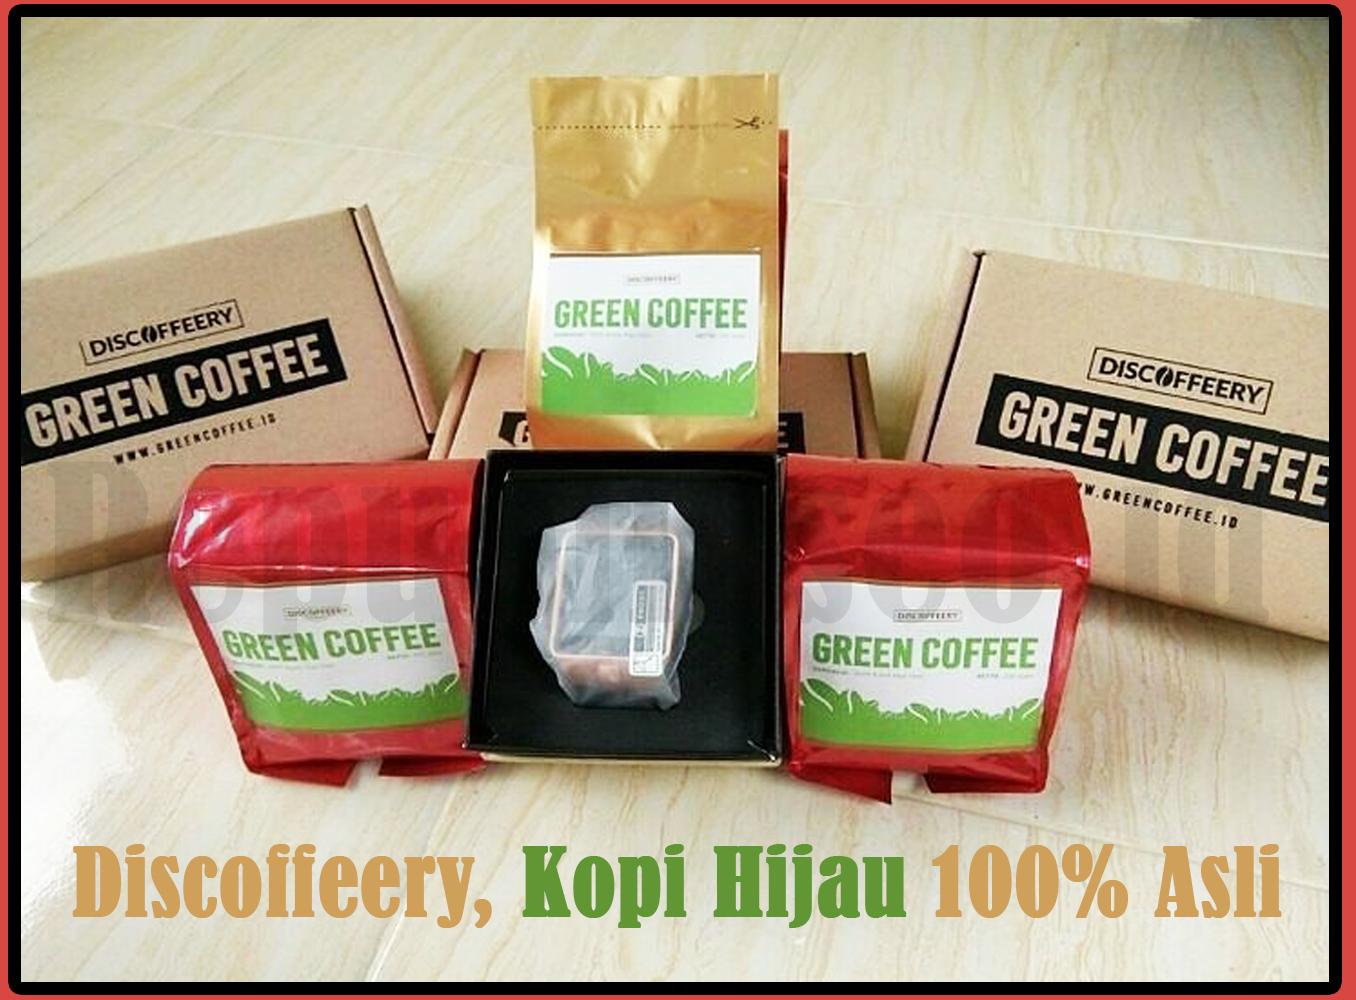 Discoffeery Kopi Hijau 100 Asli Belajar Seo Blog Green Coffee Siap Minum Apa Itu